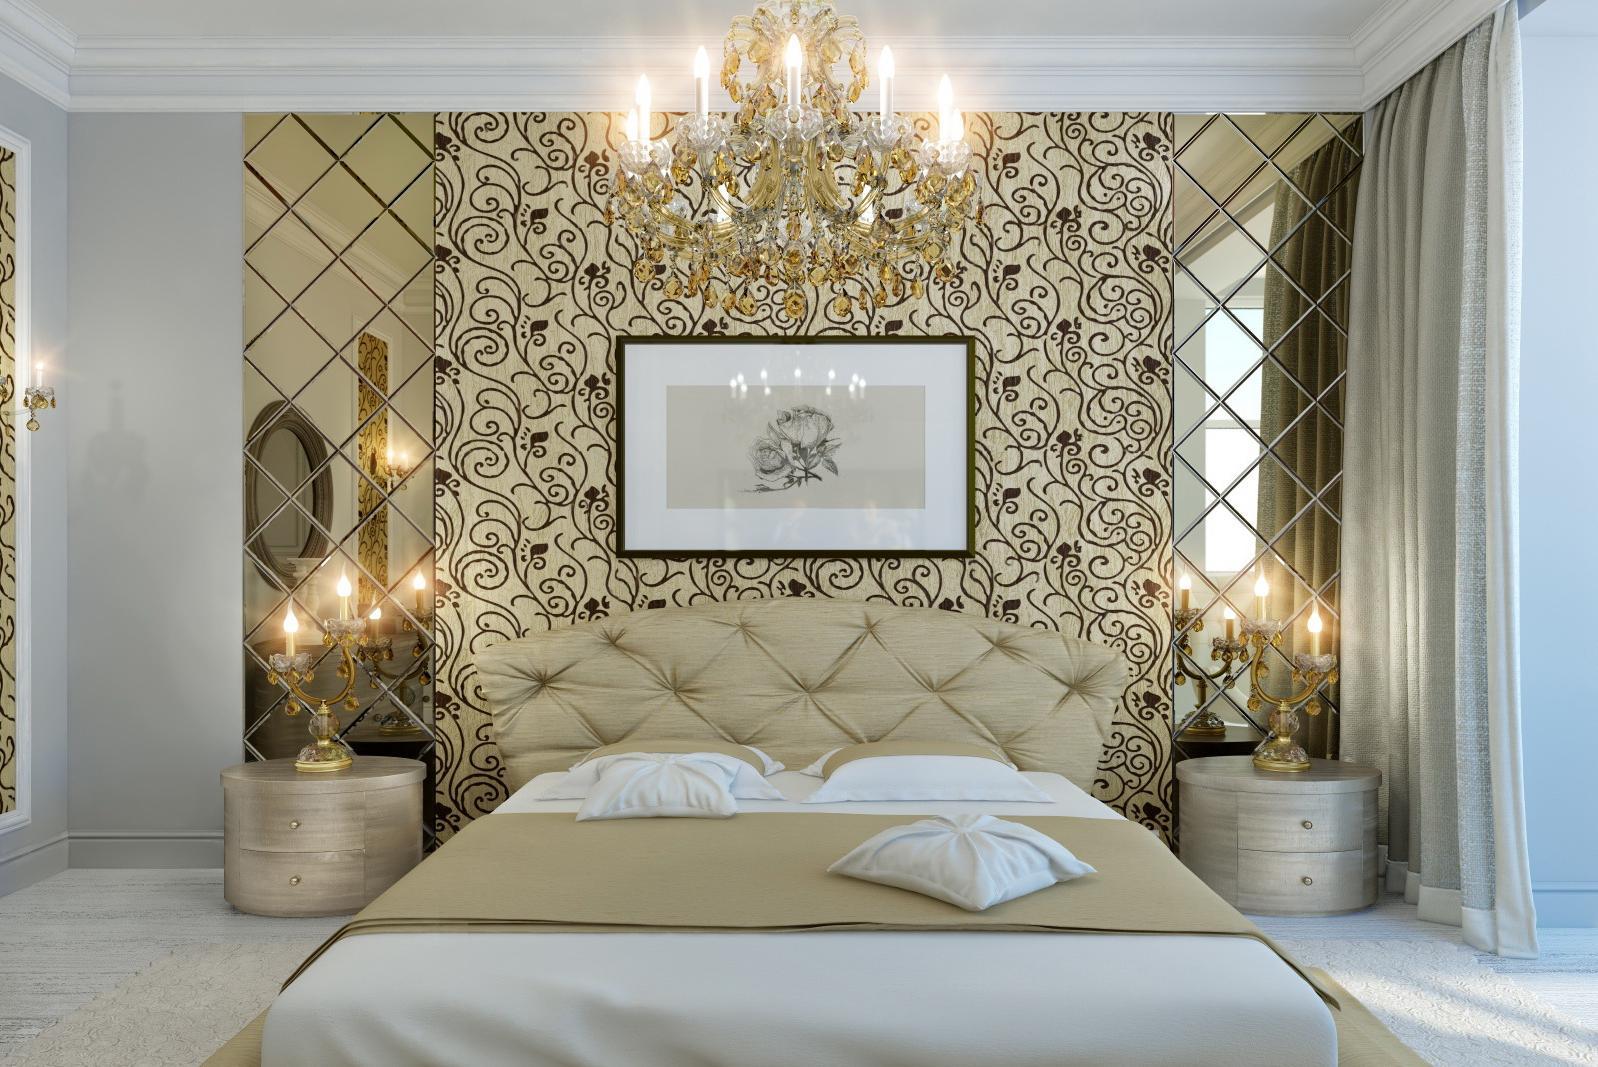 bedroom wall decor gold 1598x1067